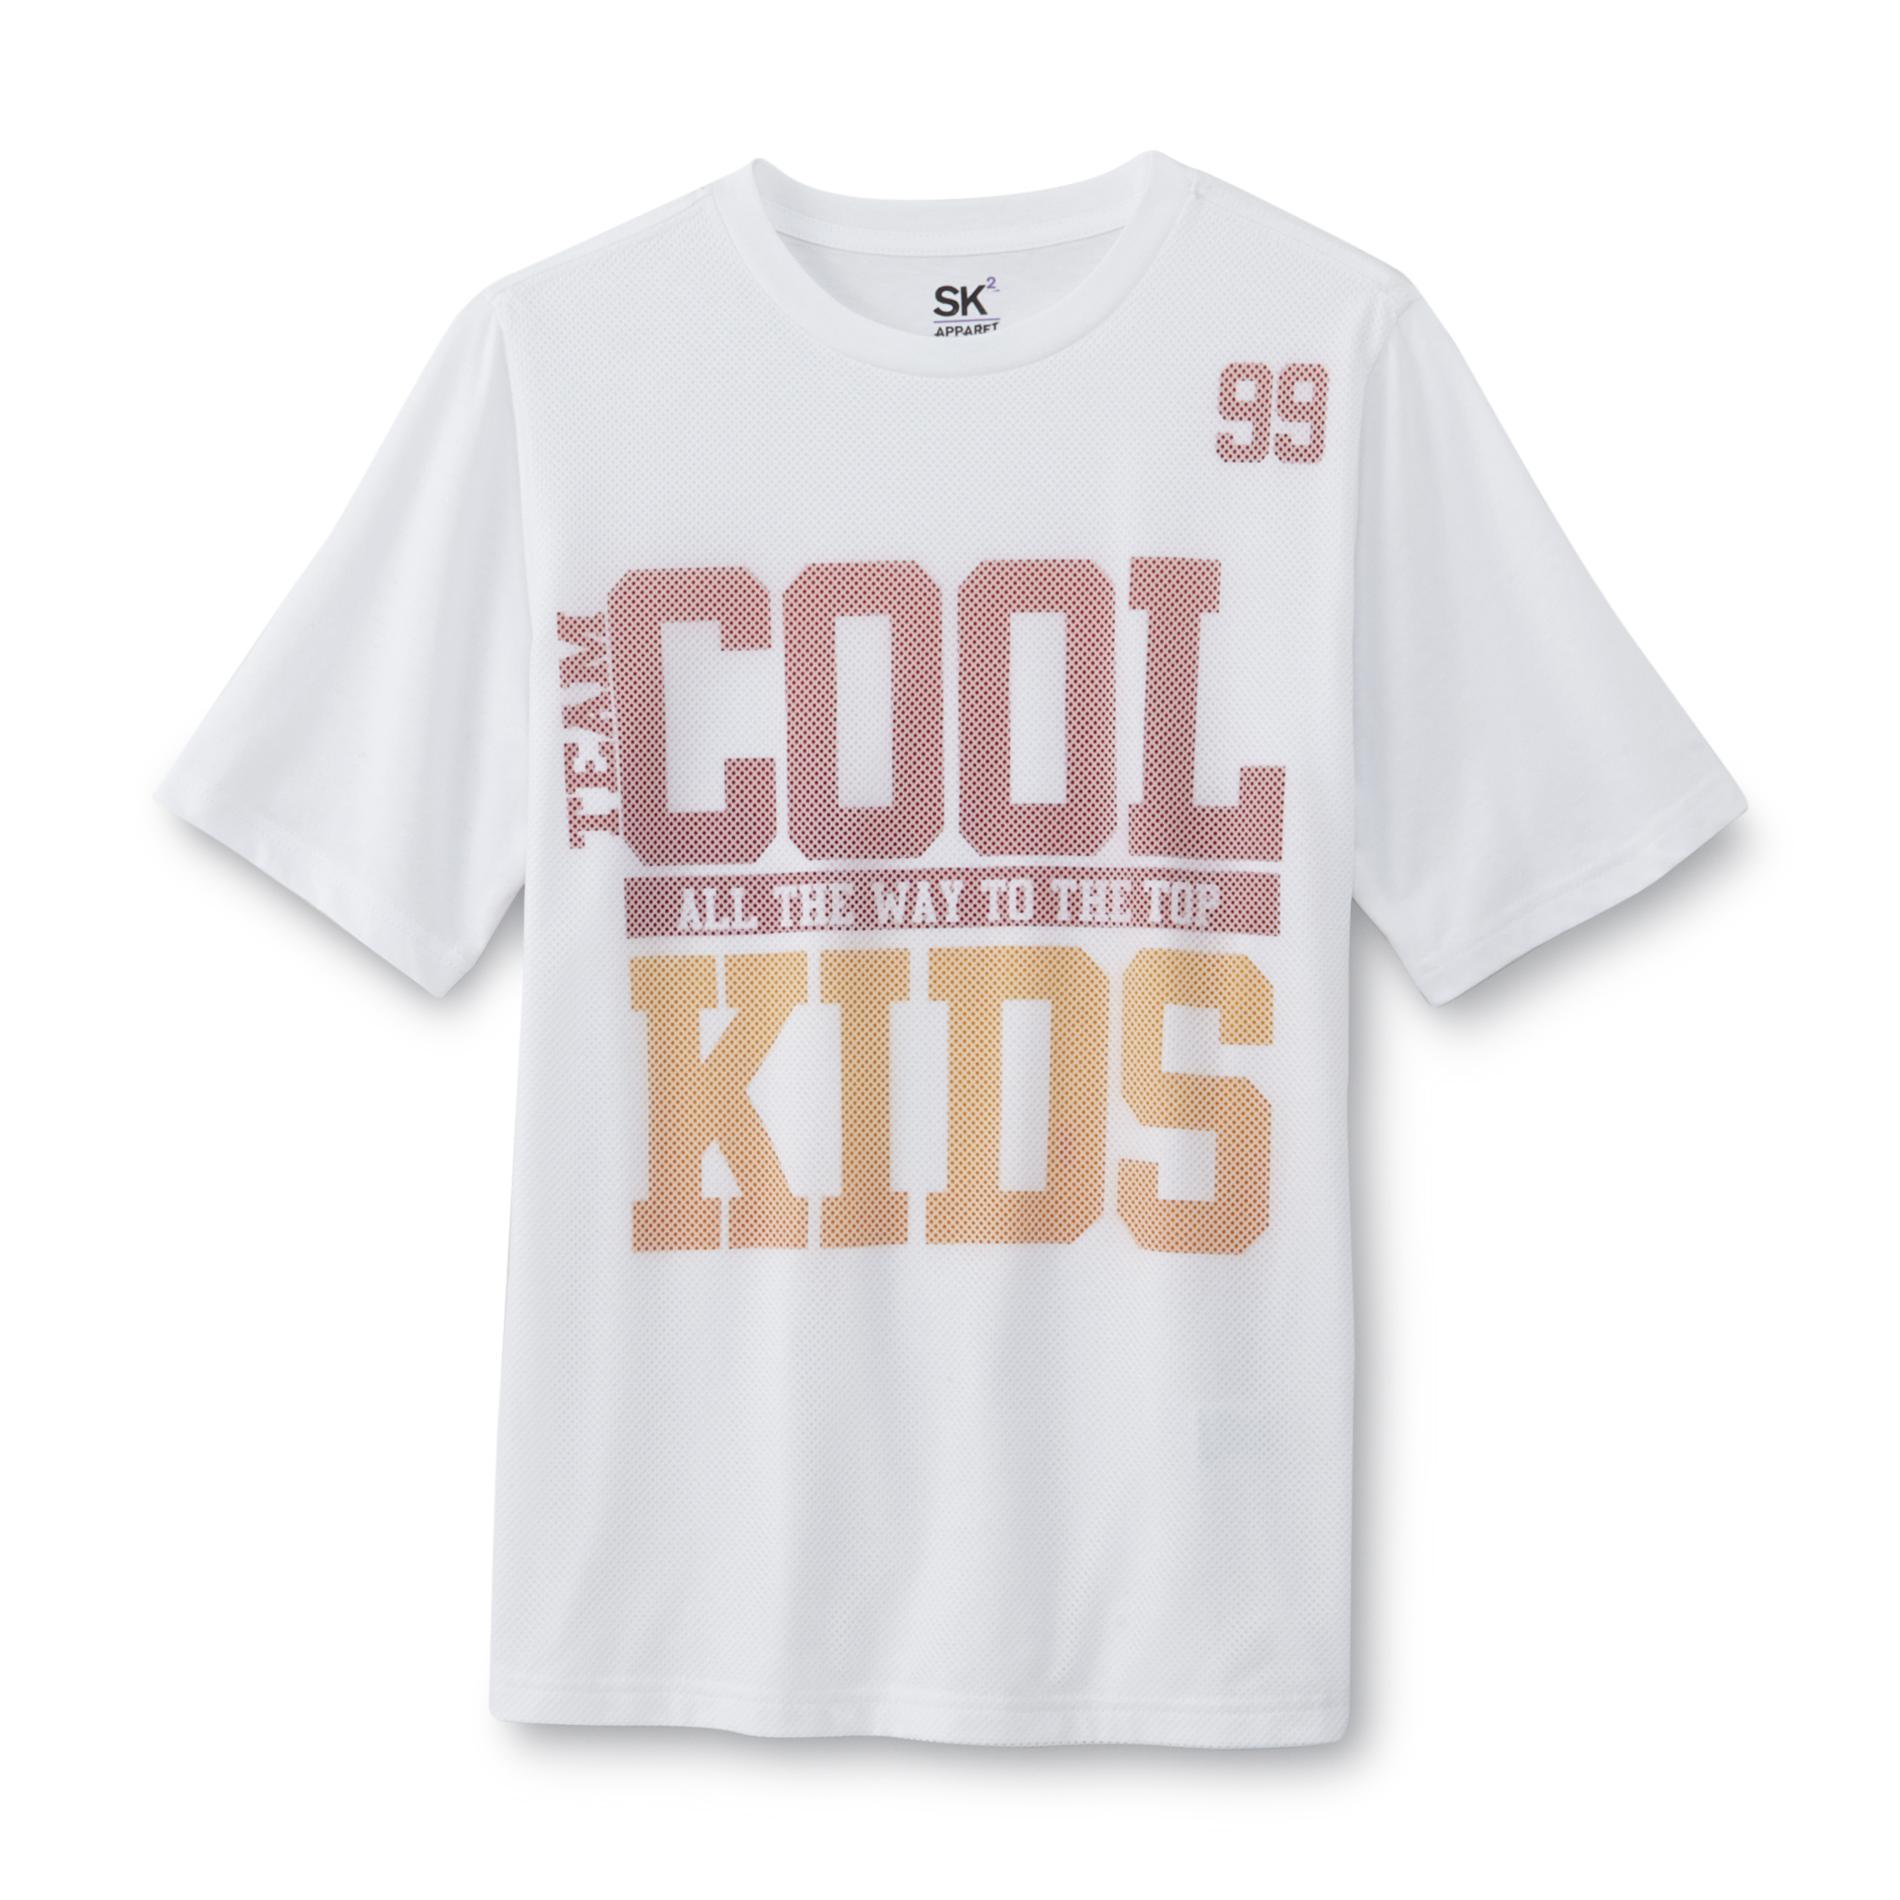 SK2 Boy's Graphic T-Shirt - Cool Kids